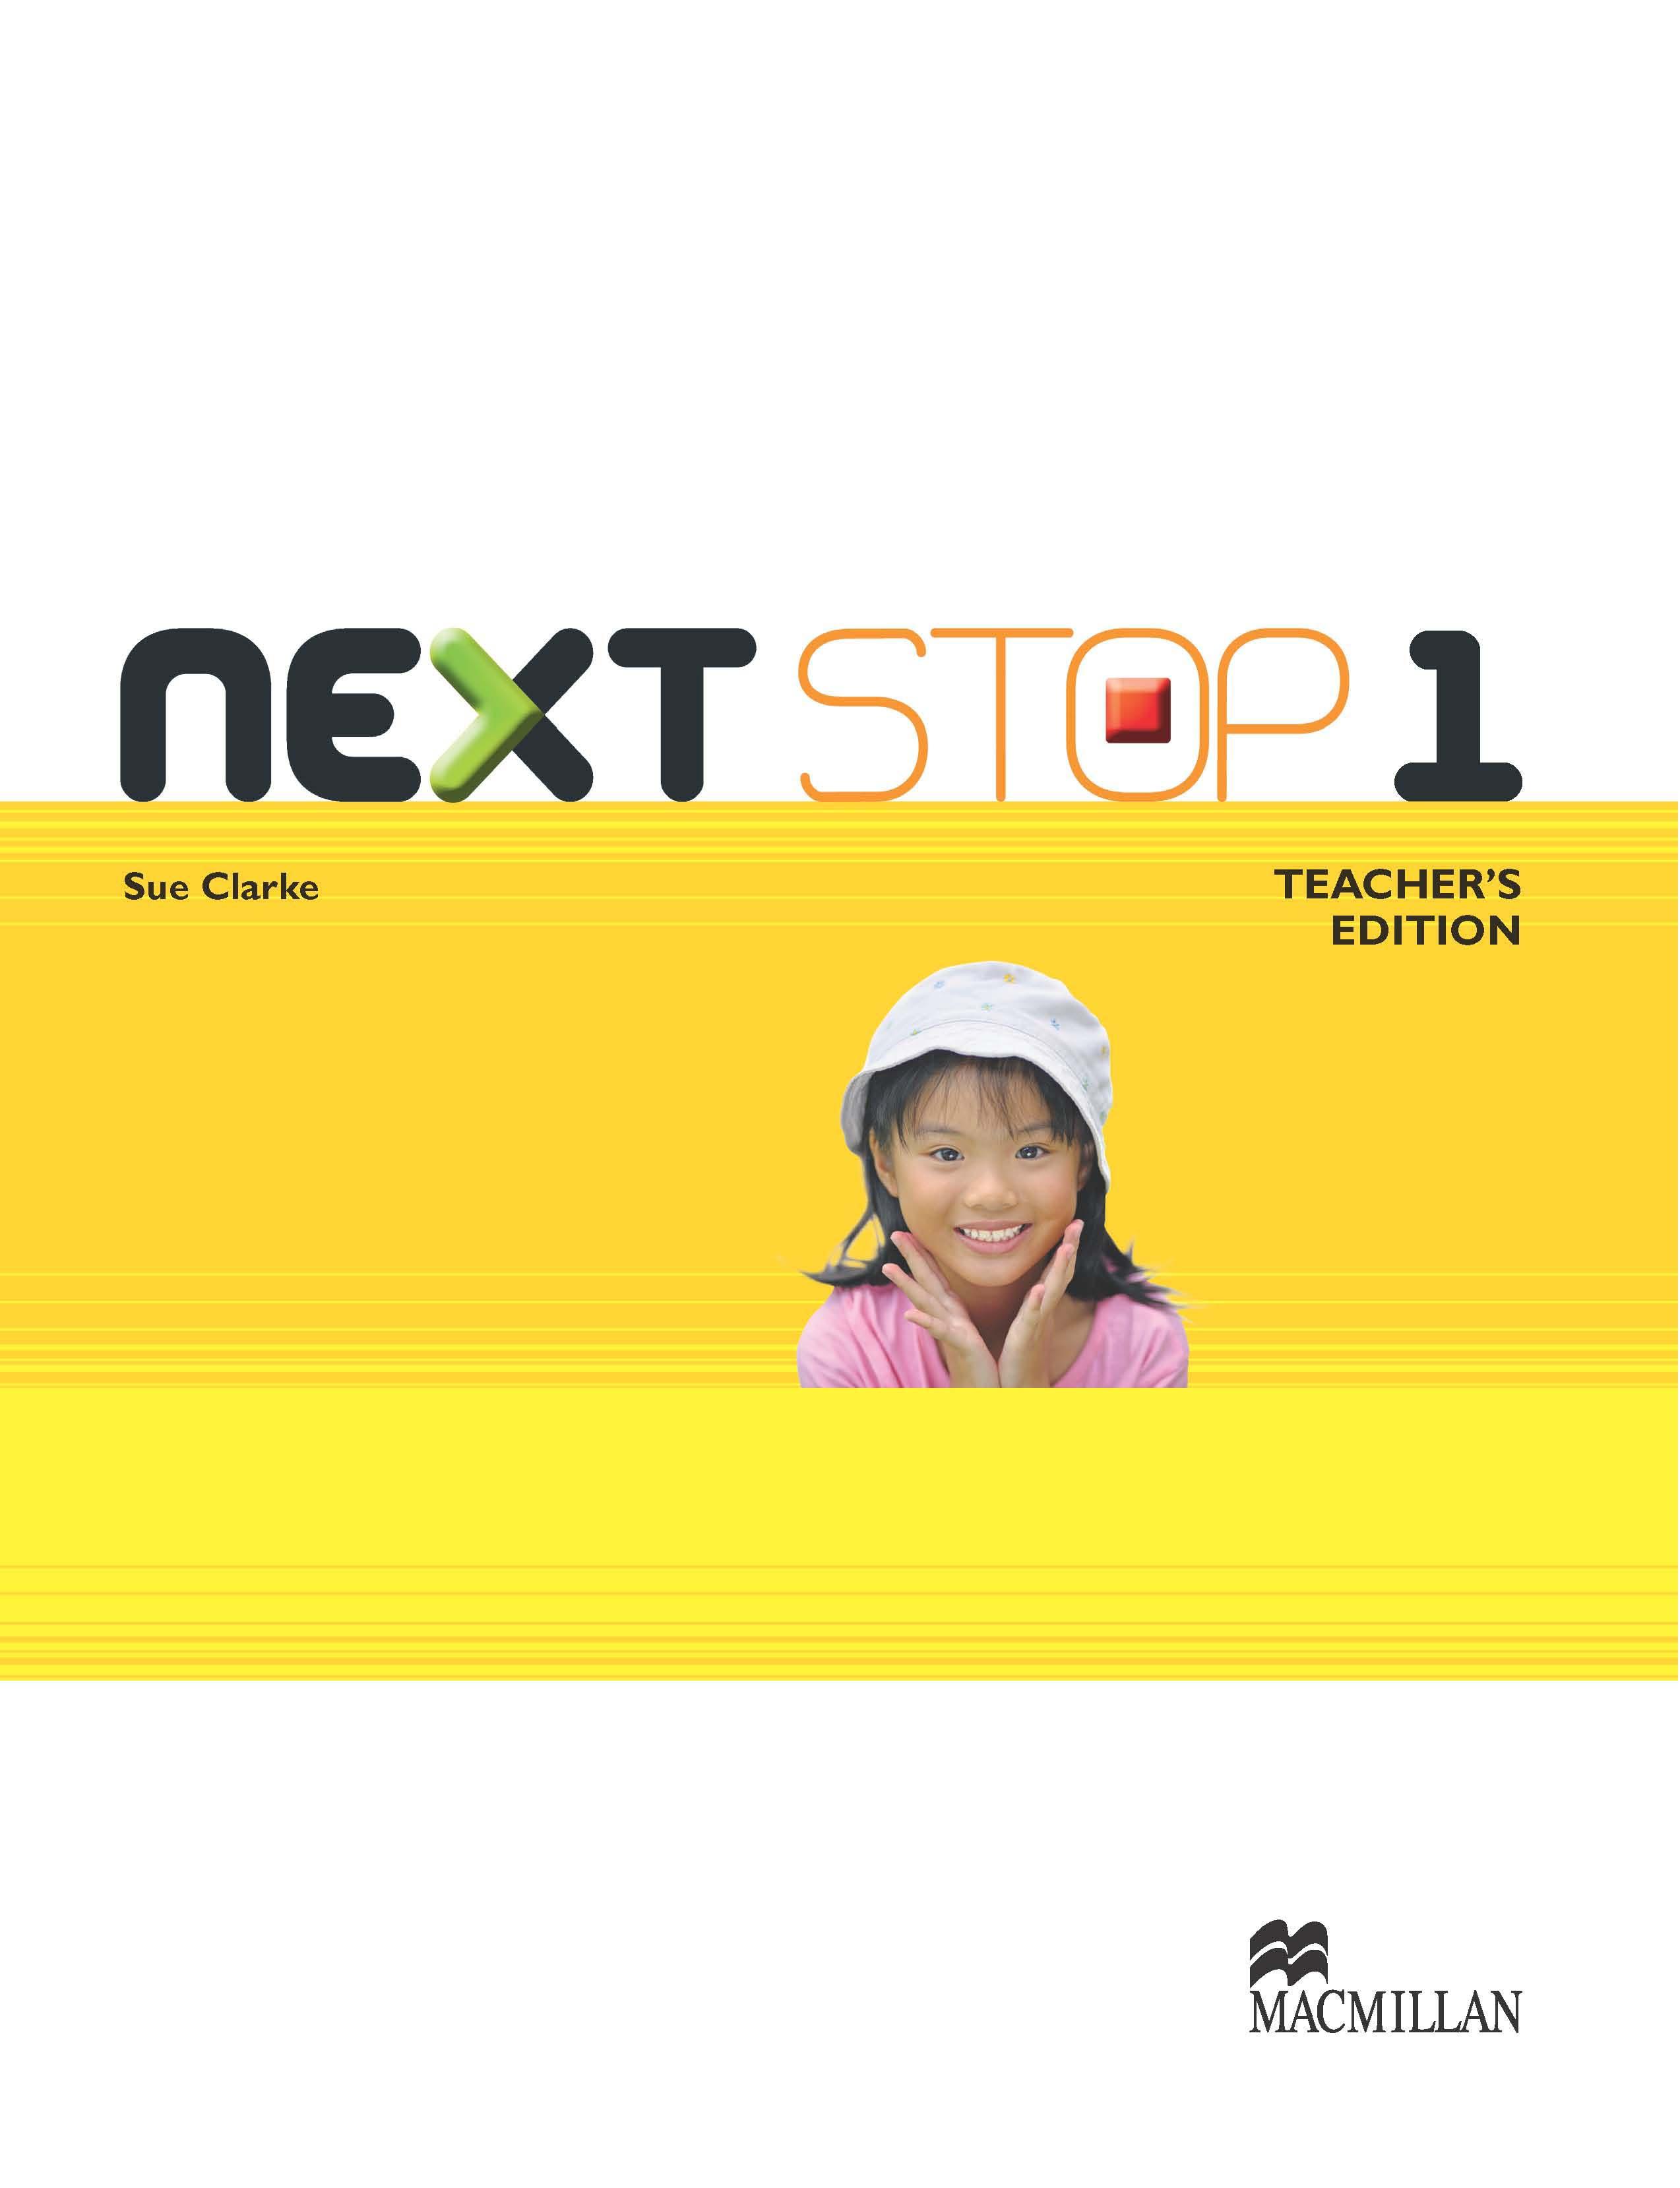 Next Stop 3 Student